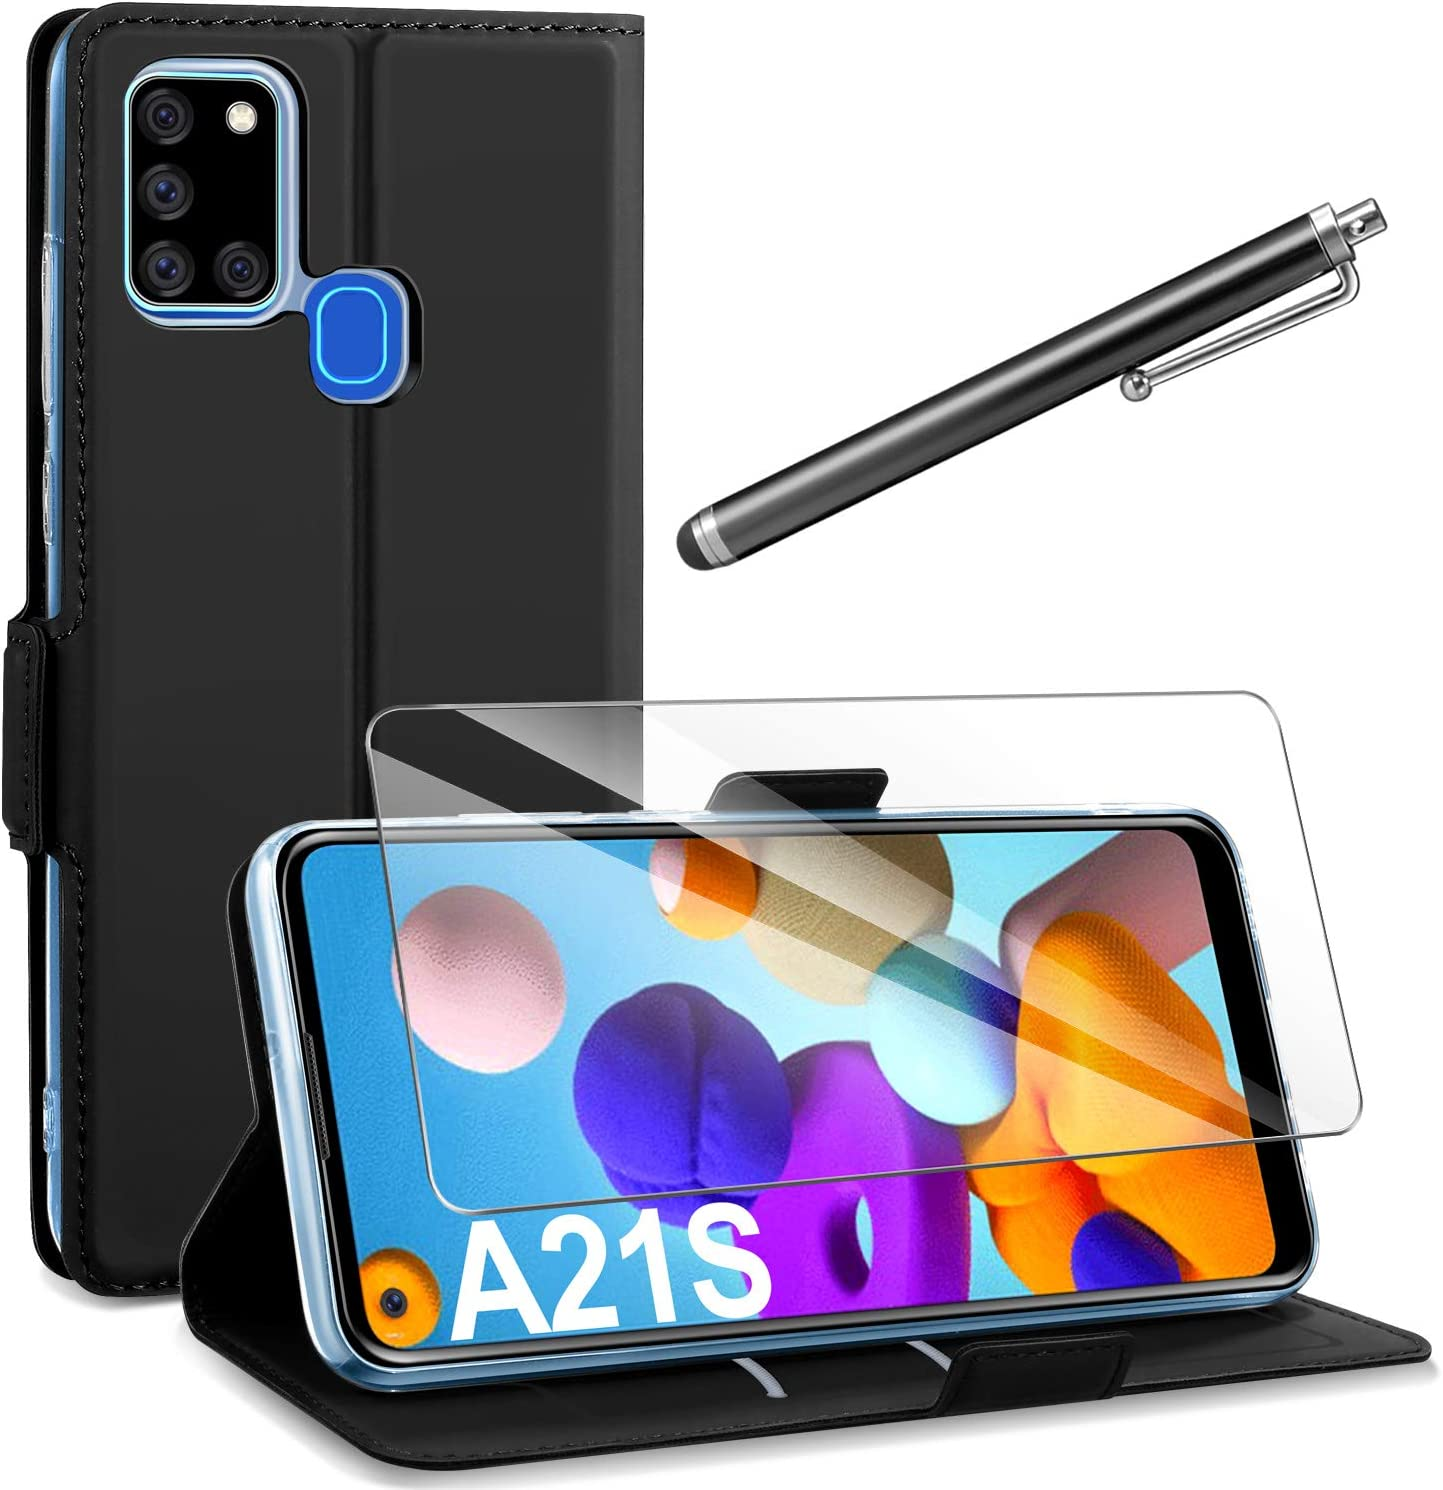 Blau TANYO H/ülle Geeignet f/ür Samsung Galaxy A21s Perspektive Luxury Mirror Mode Ultrad/ünne Handyh/ülle